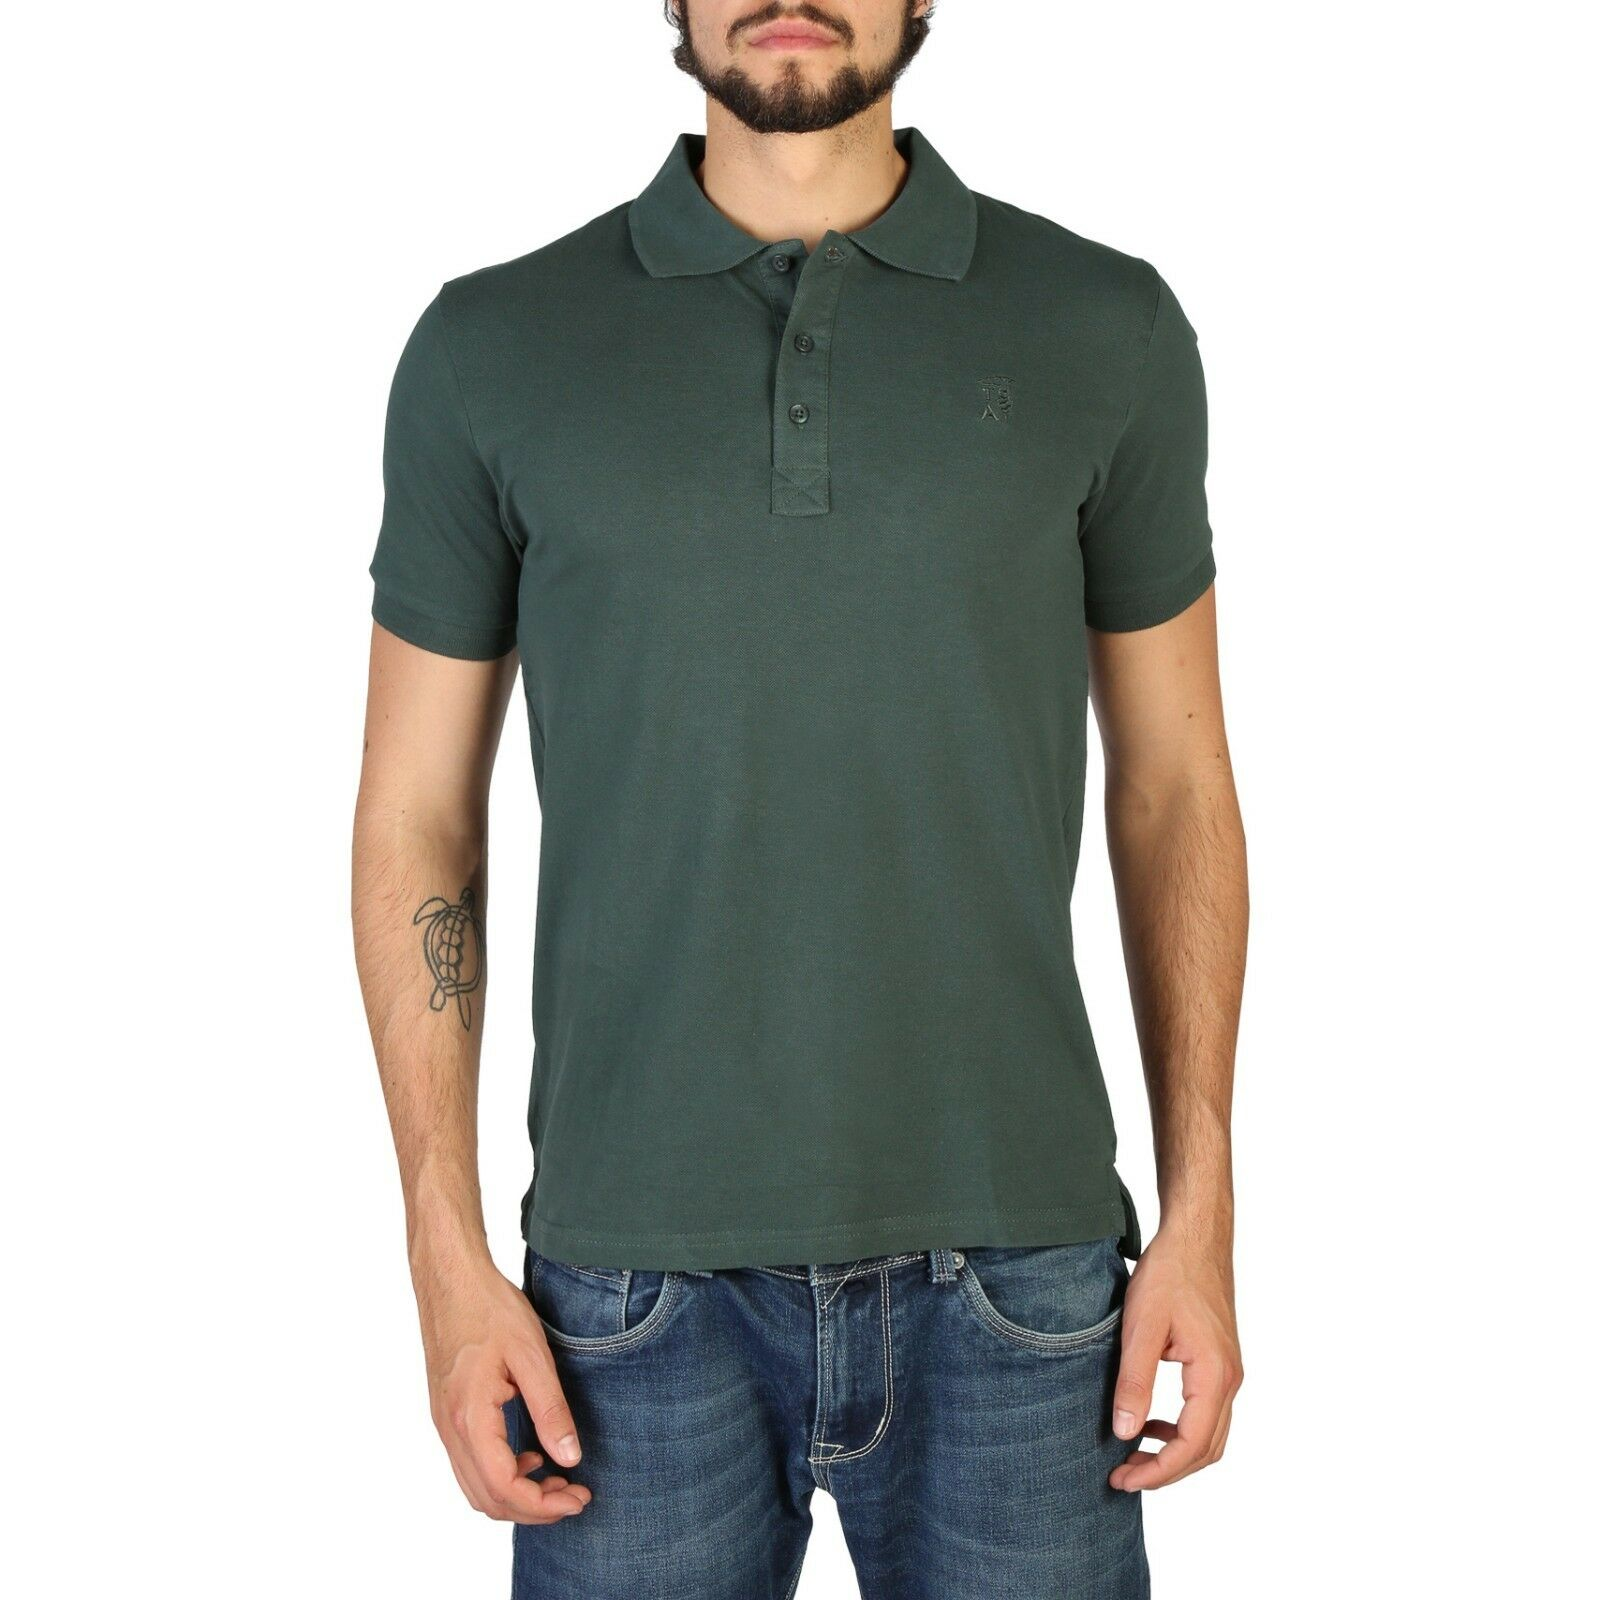 Trussardi Designer Fashion Casual Green Polo T-shirt Size XL RRP